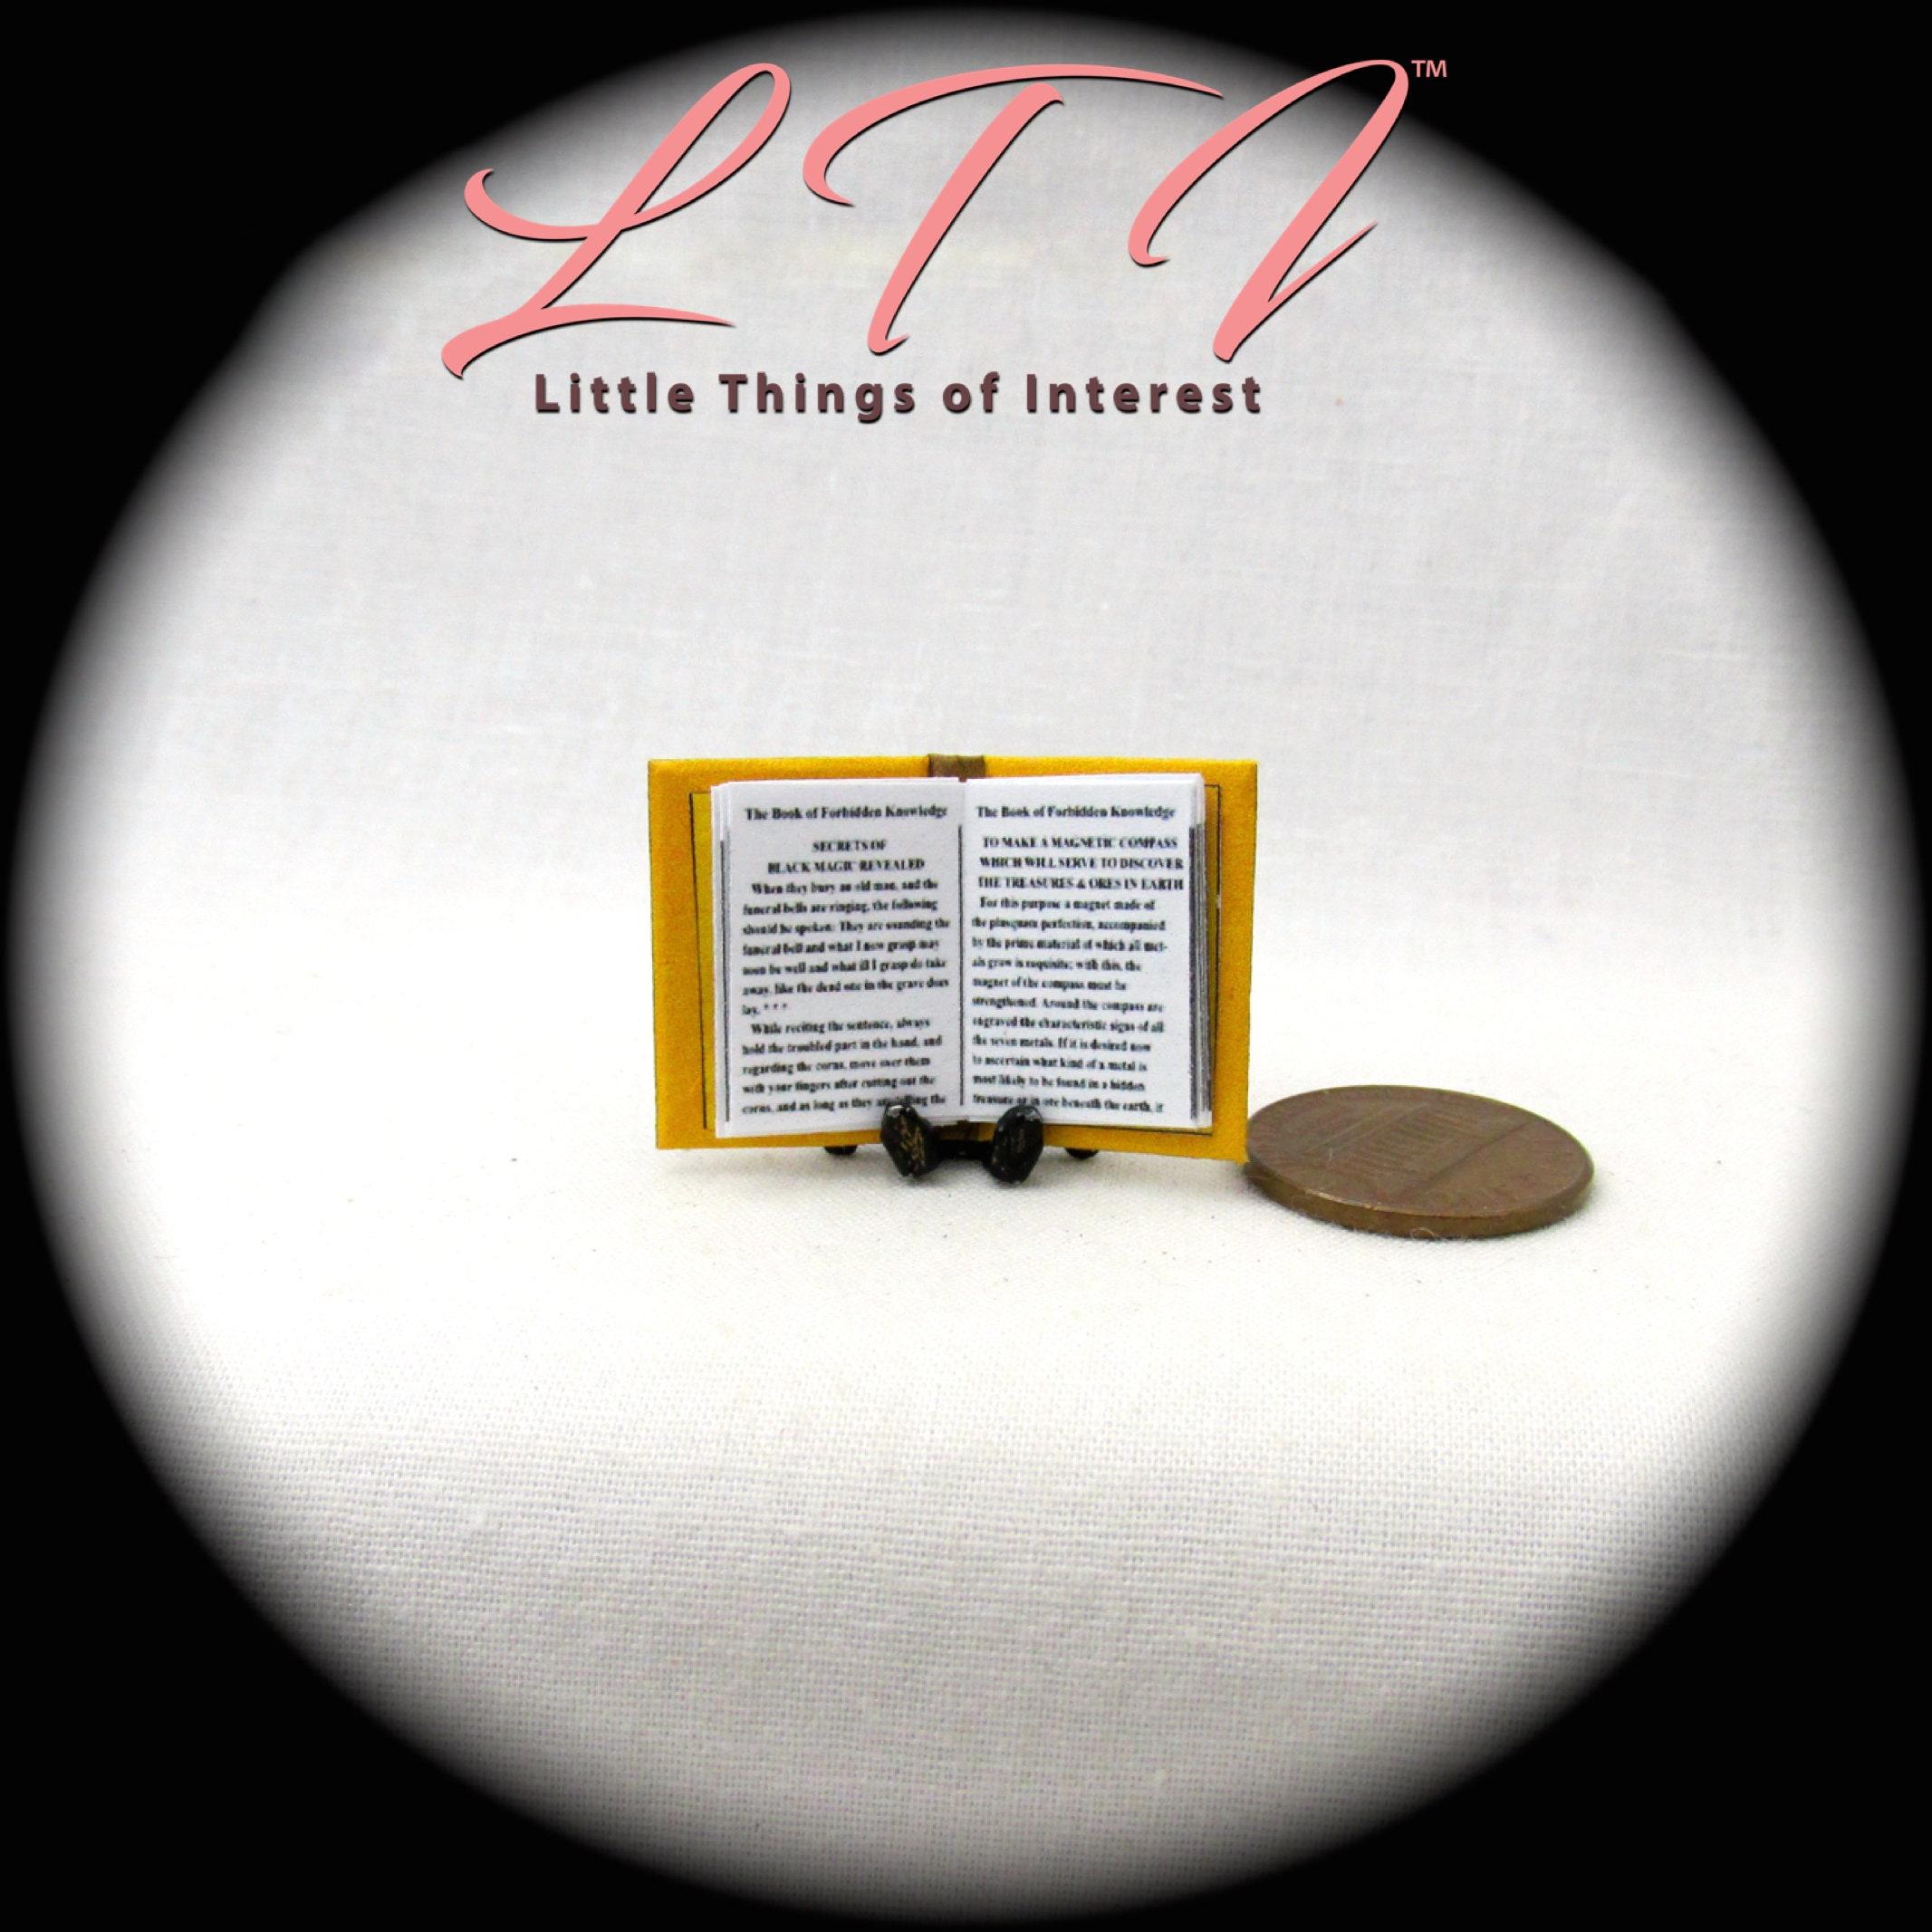 BOOK of FORBIDDEN KNOWLEDGE Miniature Book Dollhouse 1:12